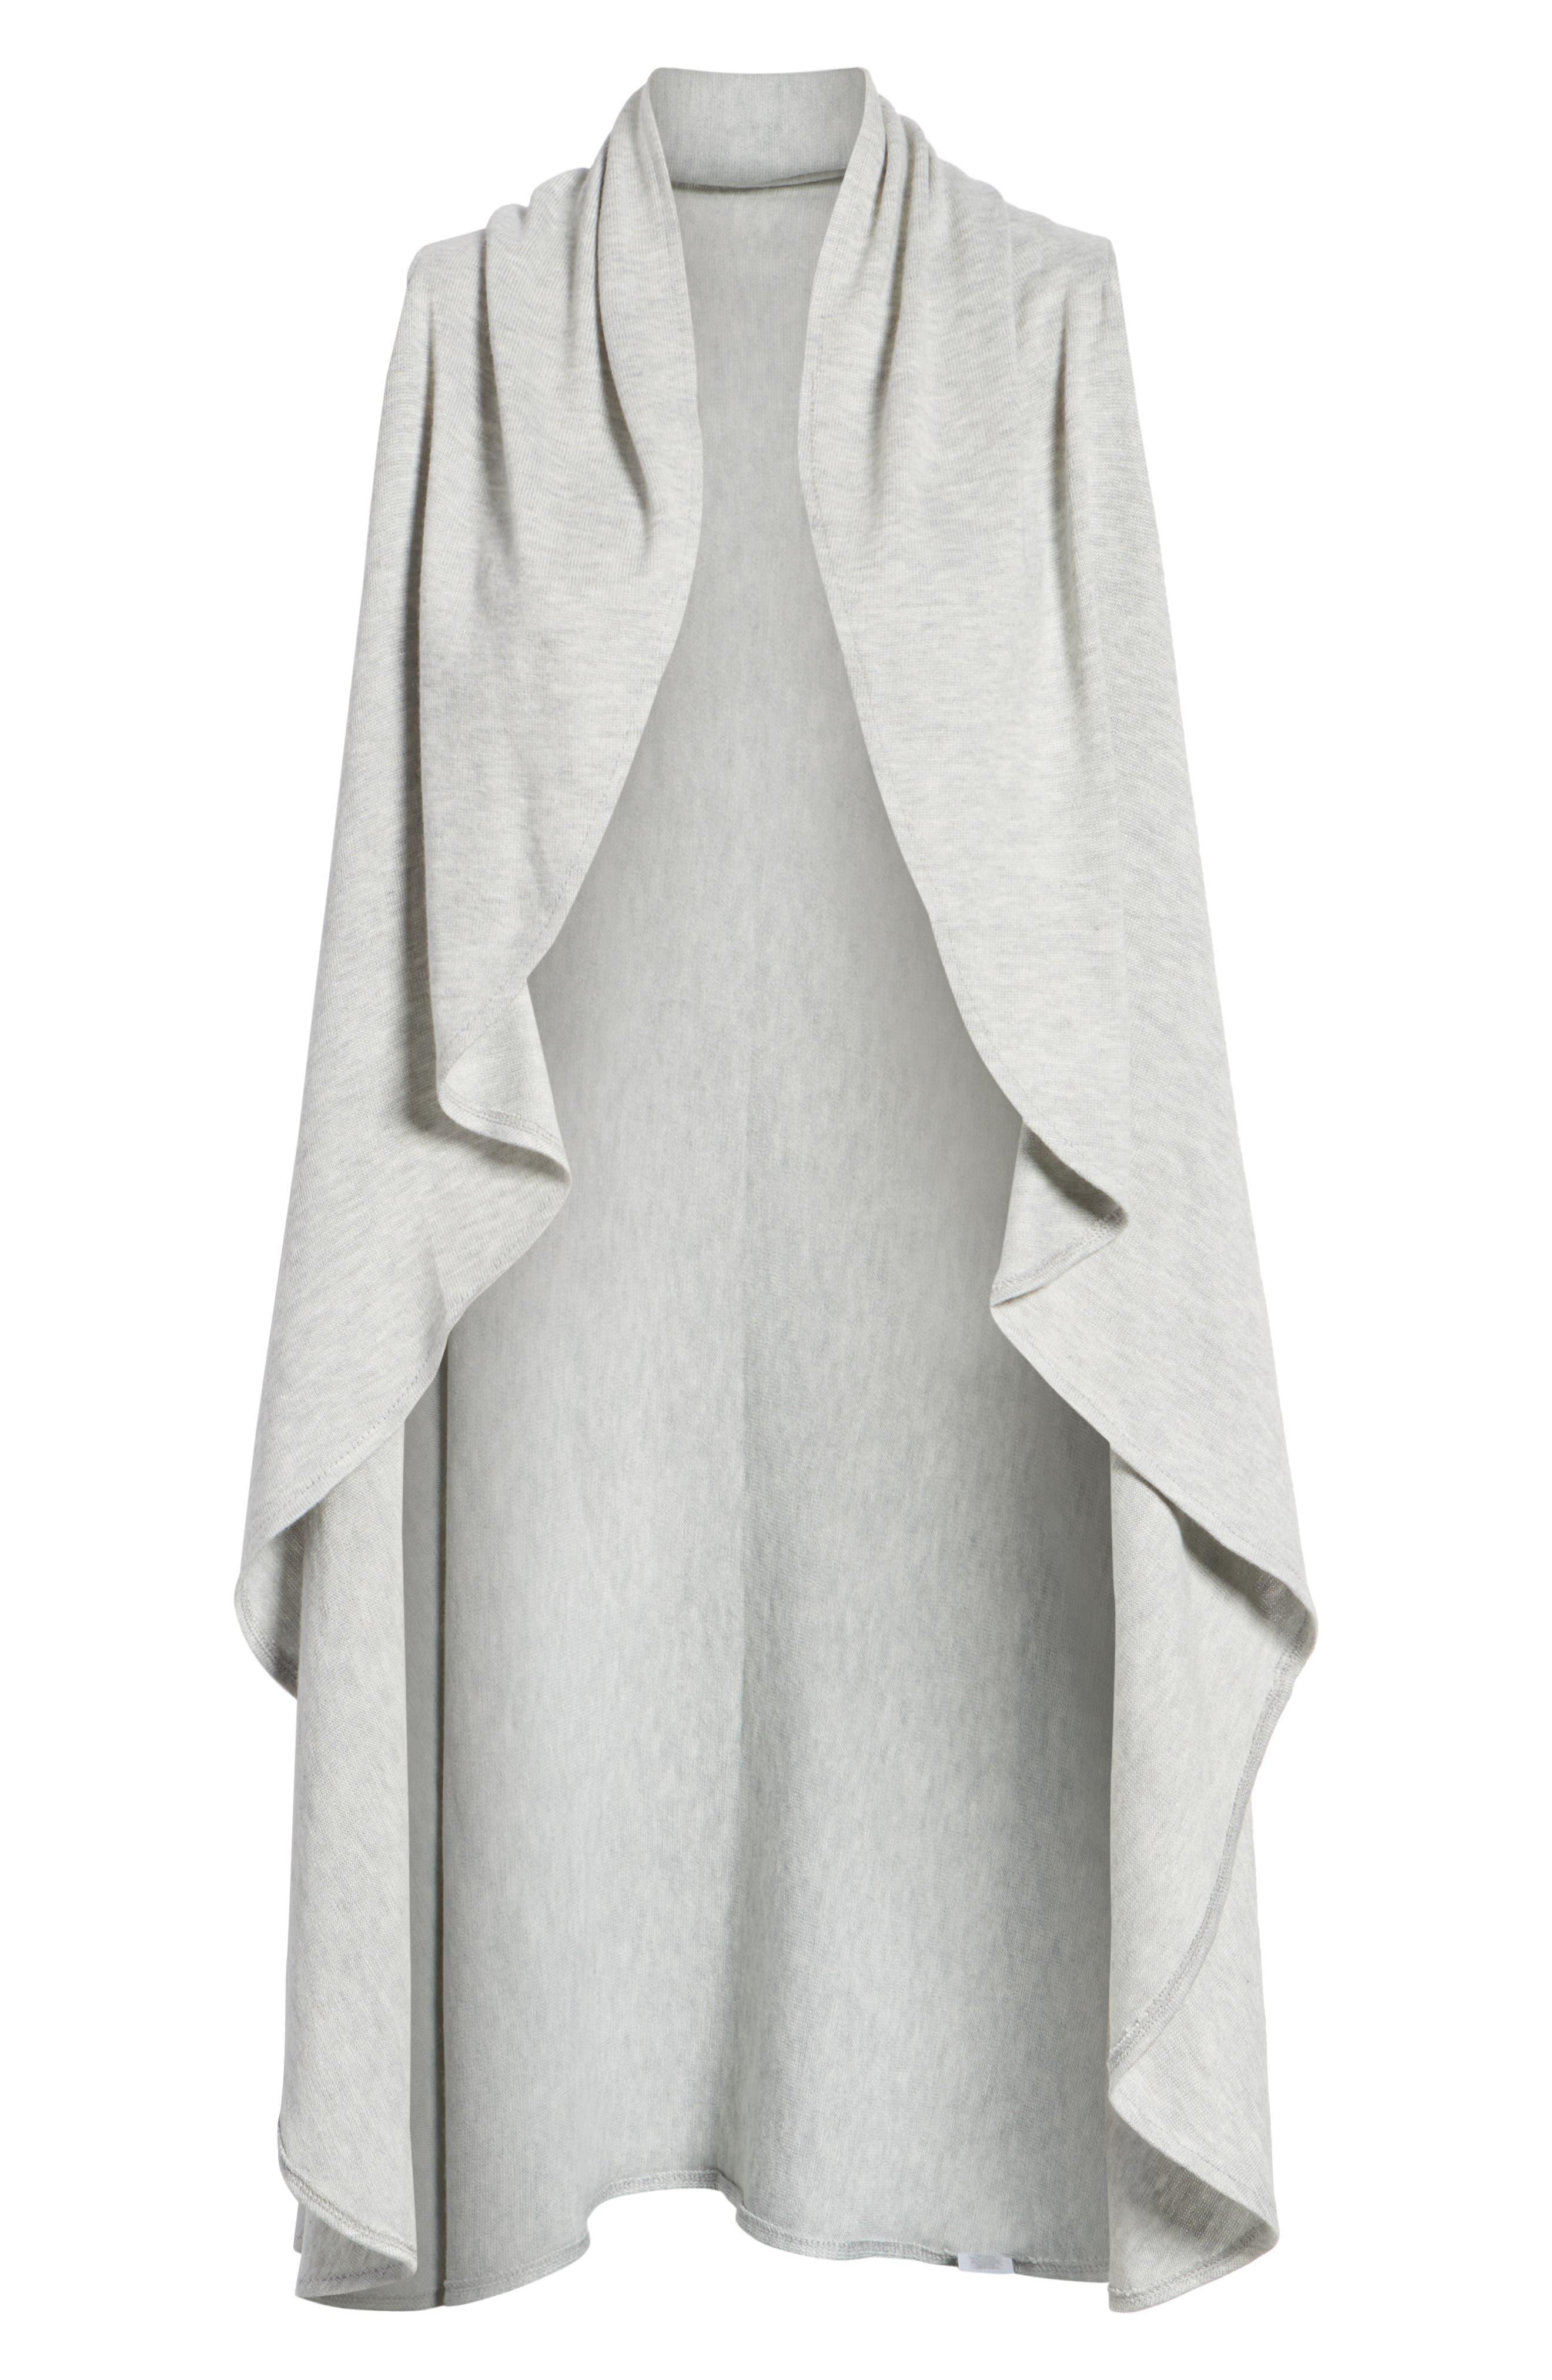 Essential Knit Vest,                             Alternate thumbnail 6, color,                             GREY SOFT HEATHER